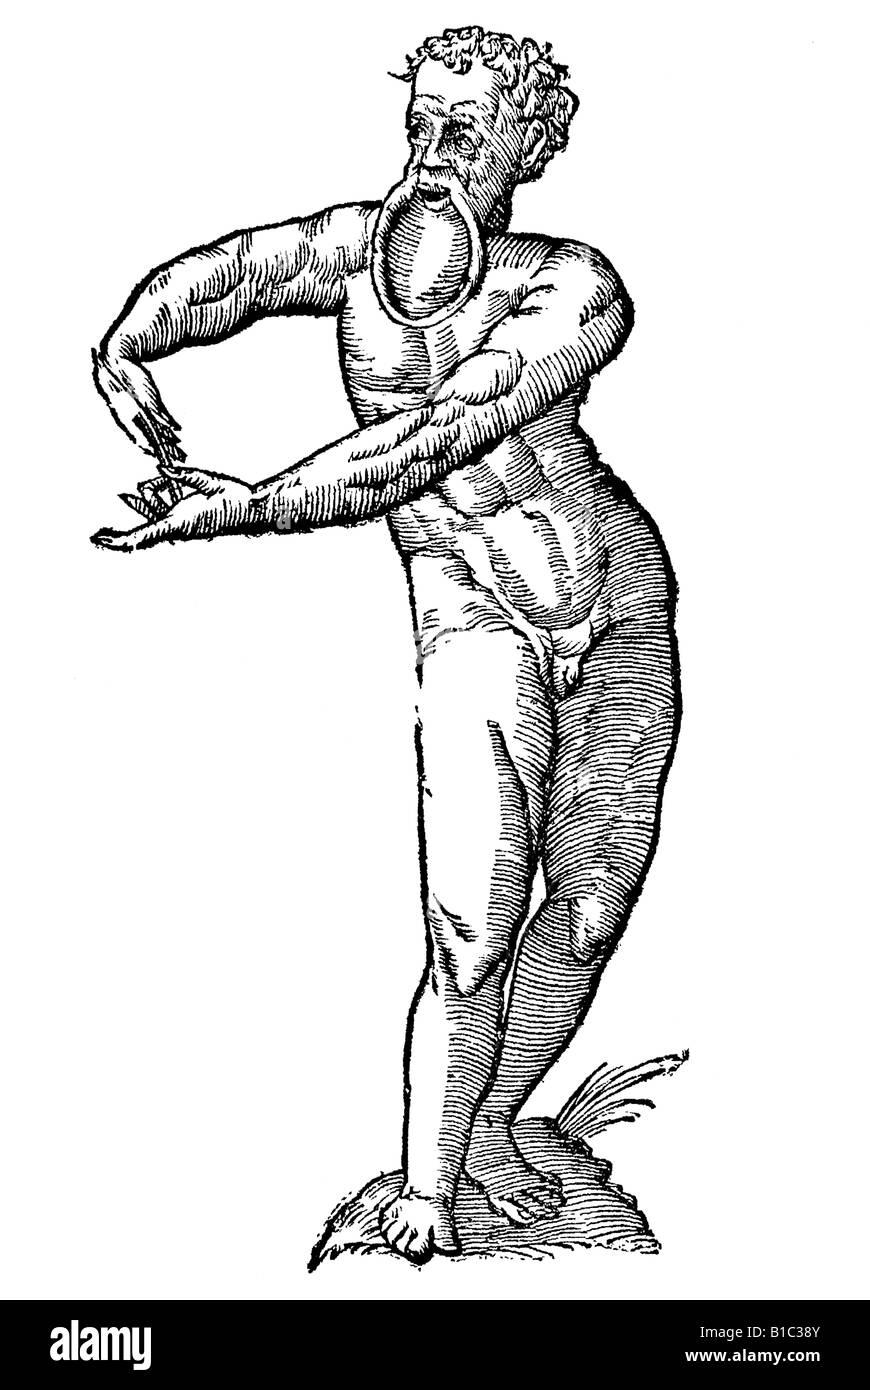 Nigrita labio inferiori pendulo, Aldrovandi, 1642, 17th century, renaissance, Europe - Stock Image